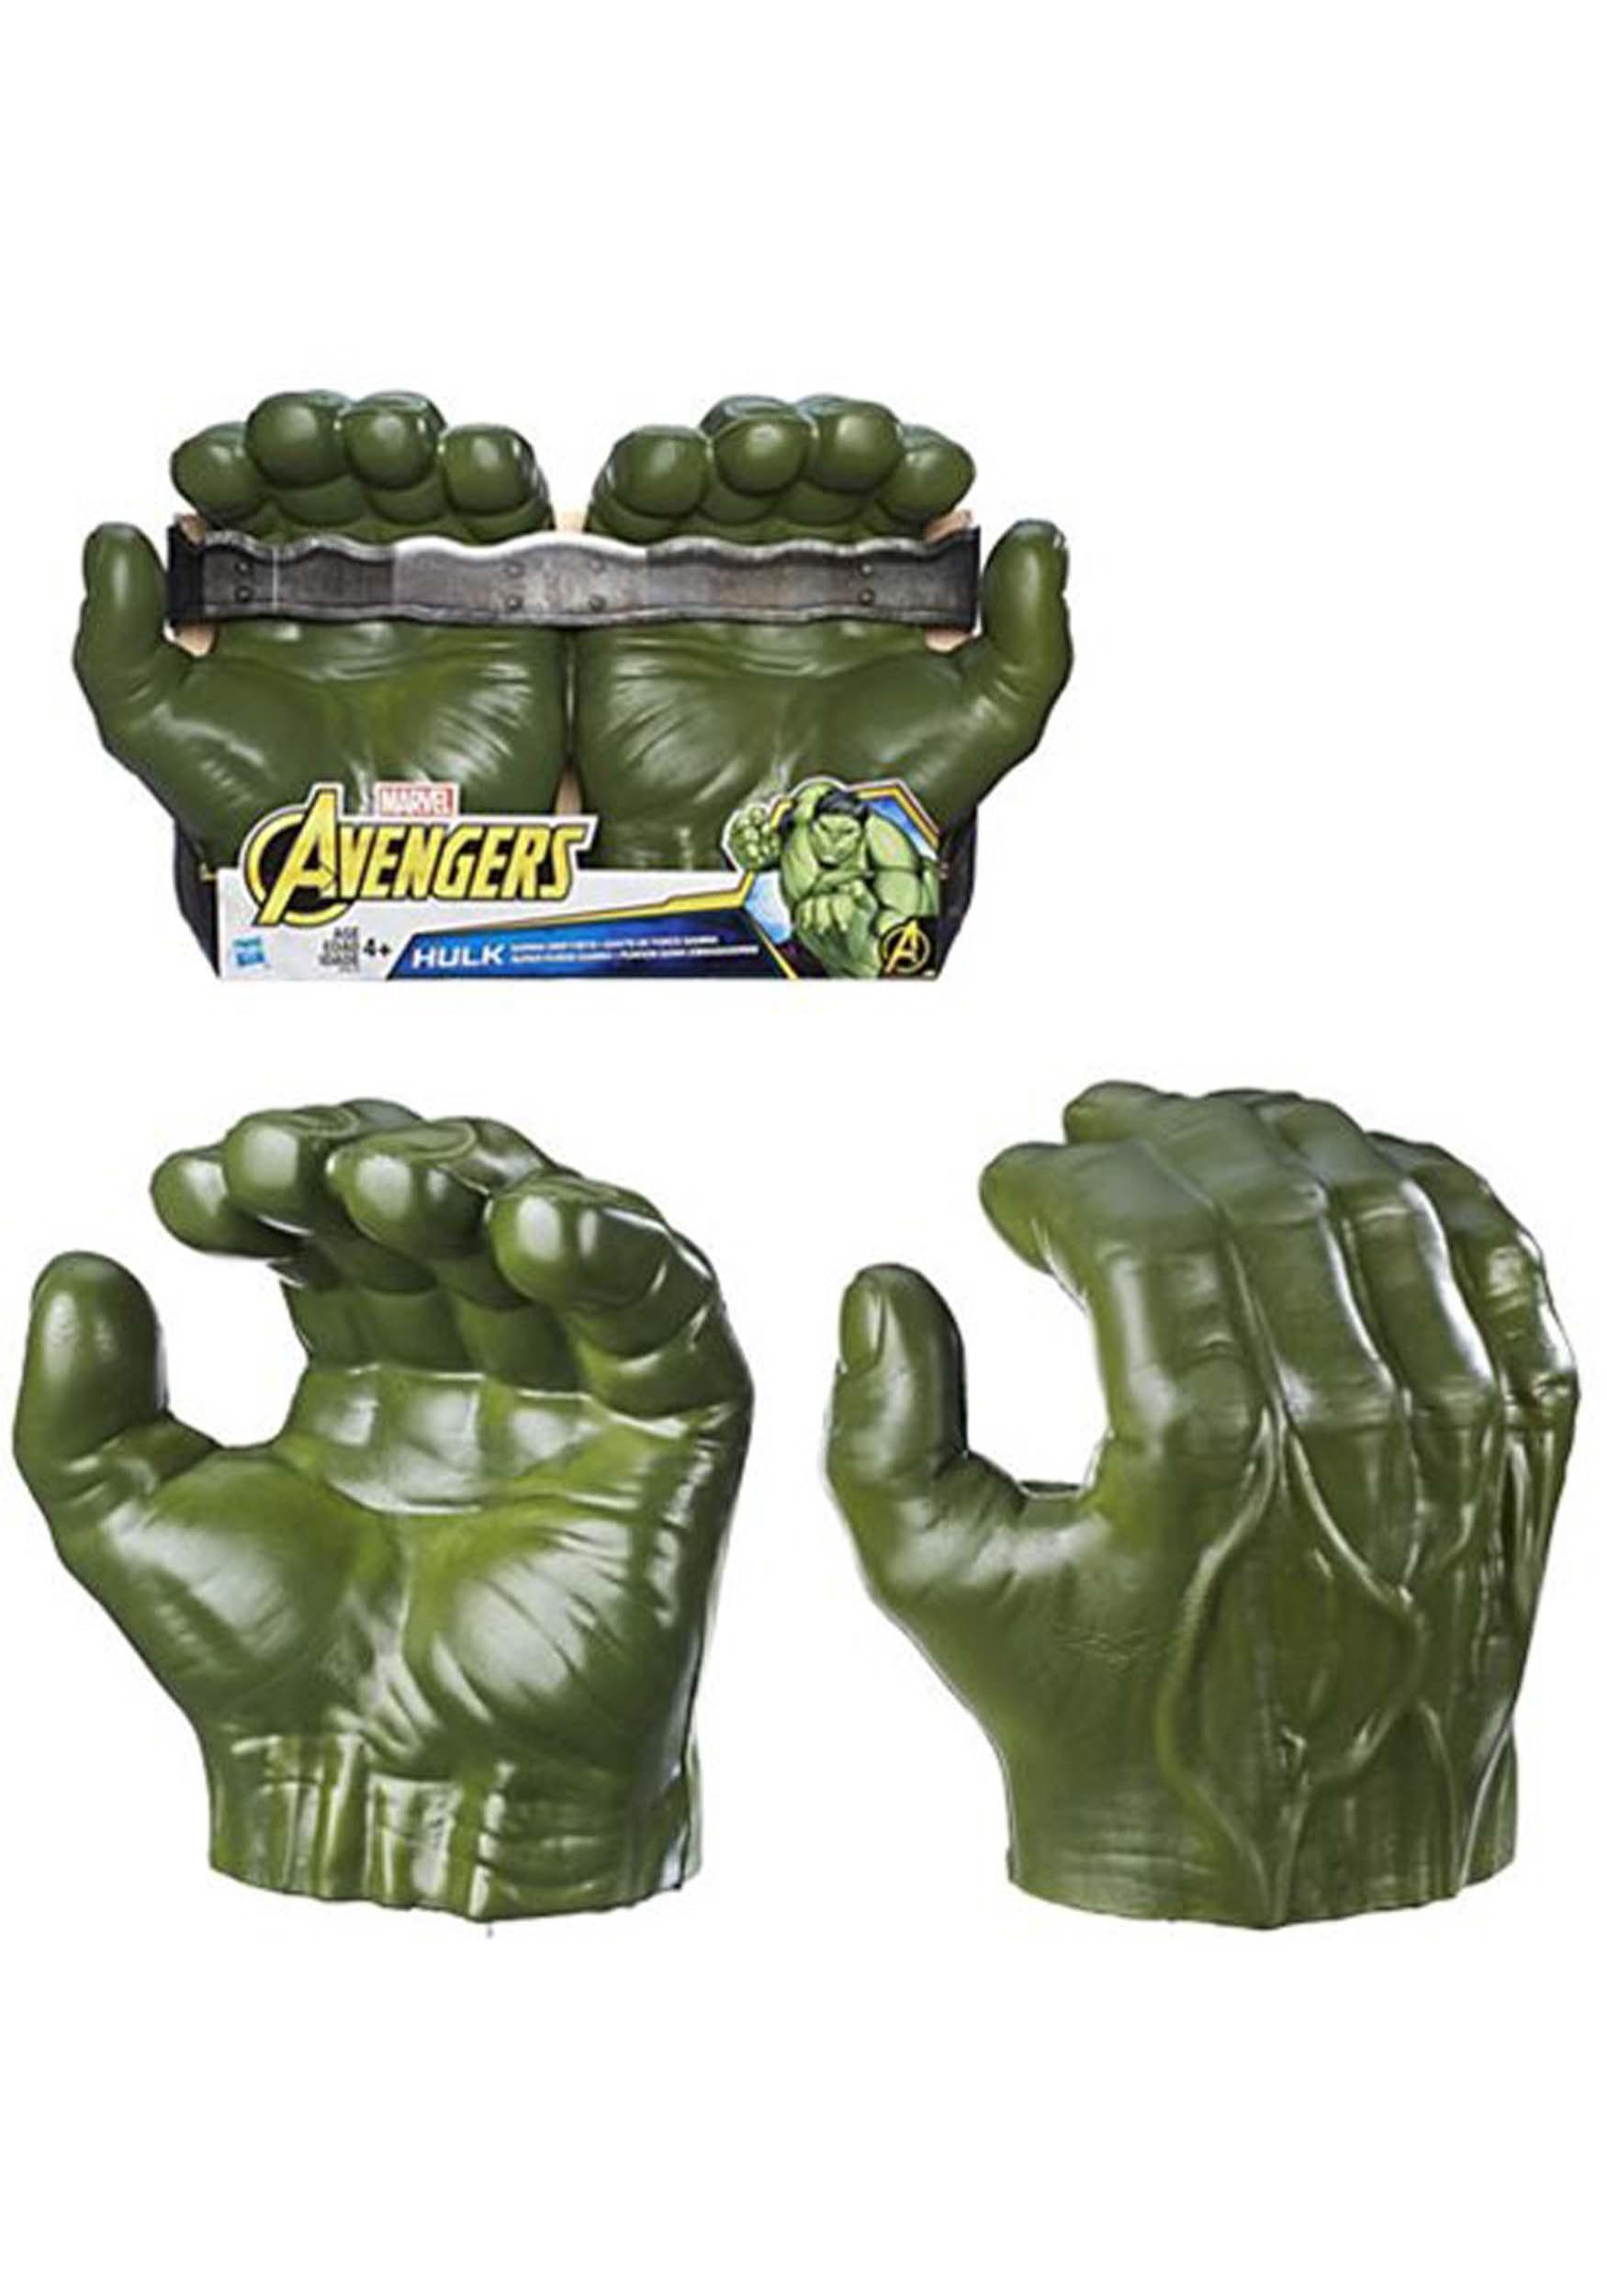 Avengers: Infinity War Hulk Gamma Grip Fists